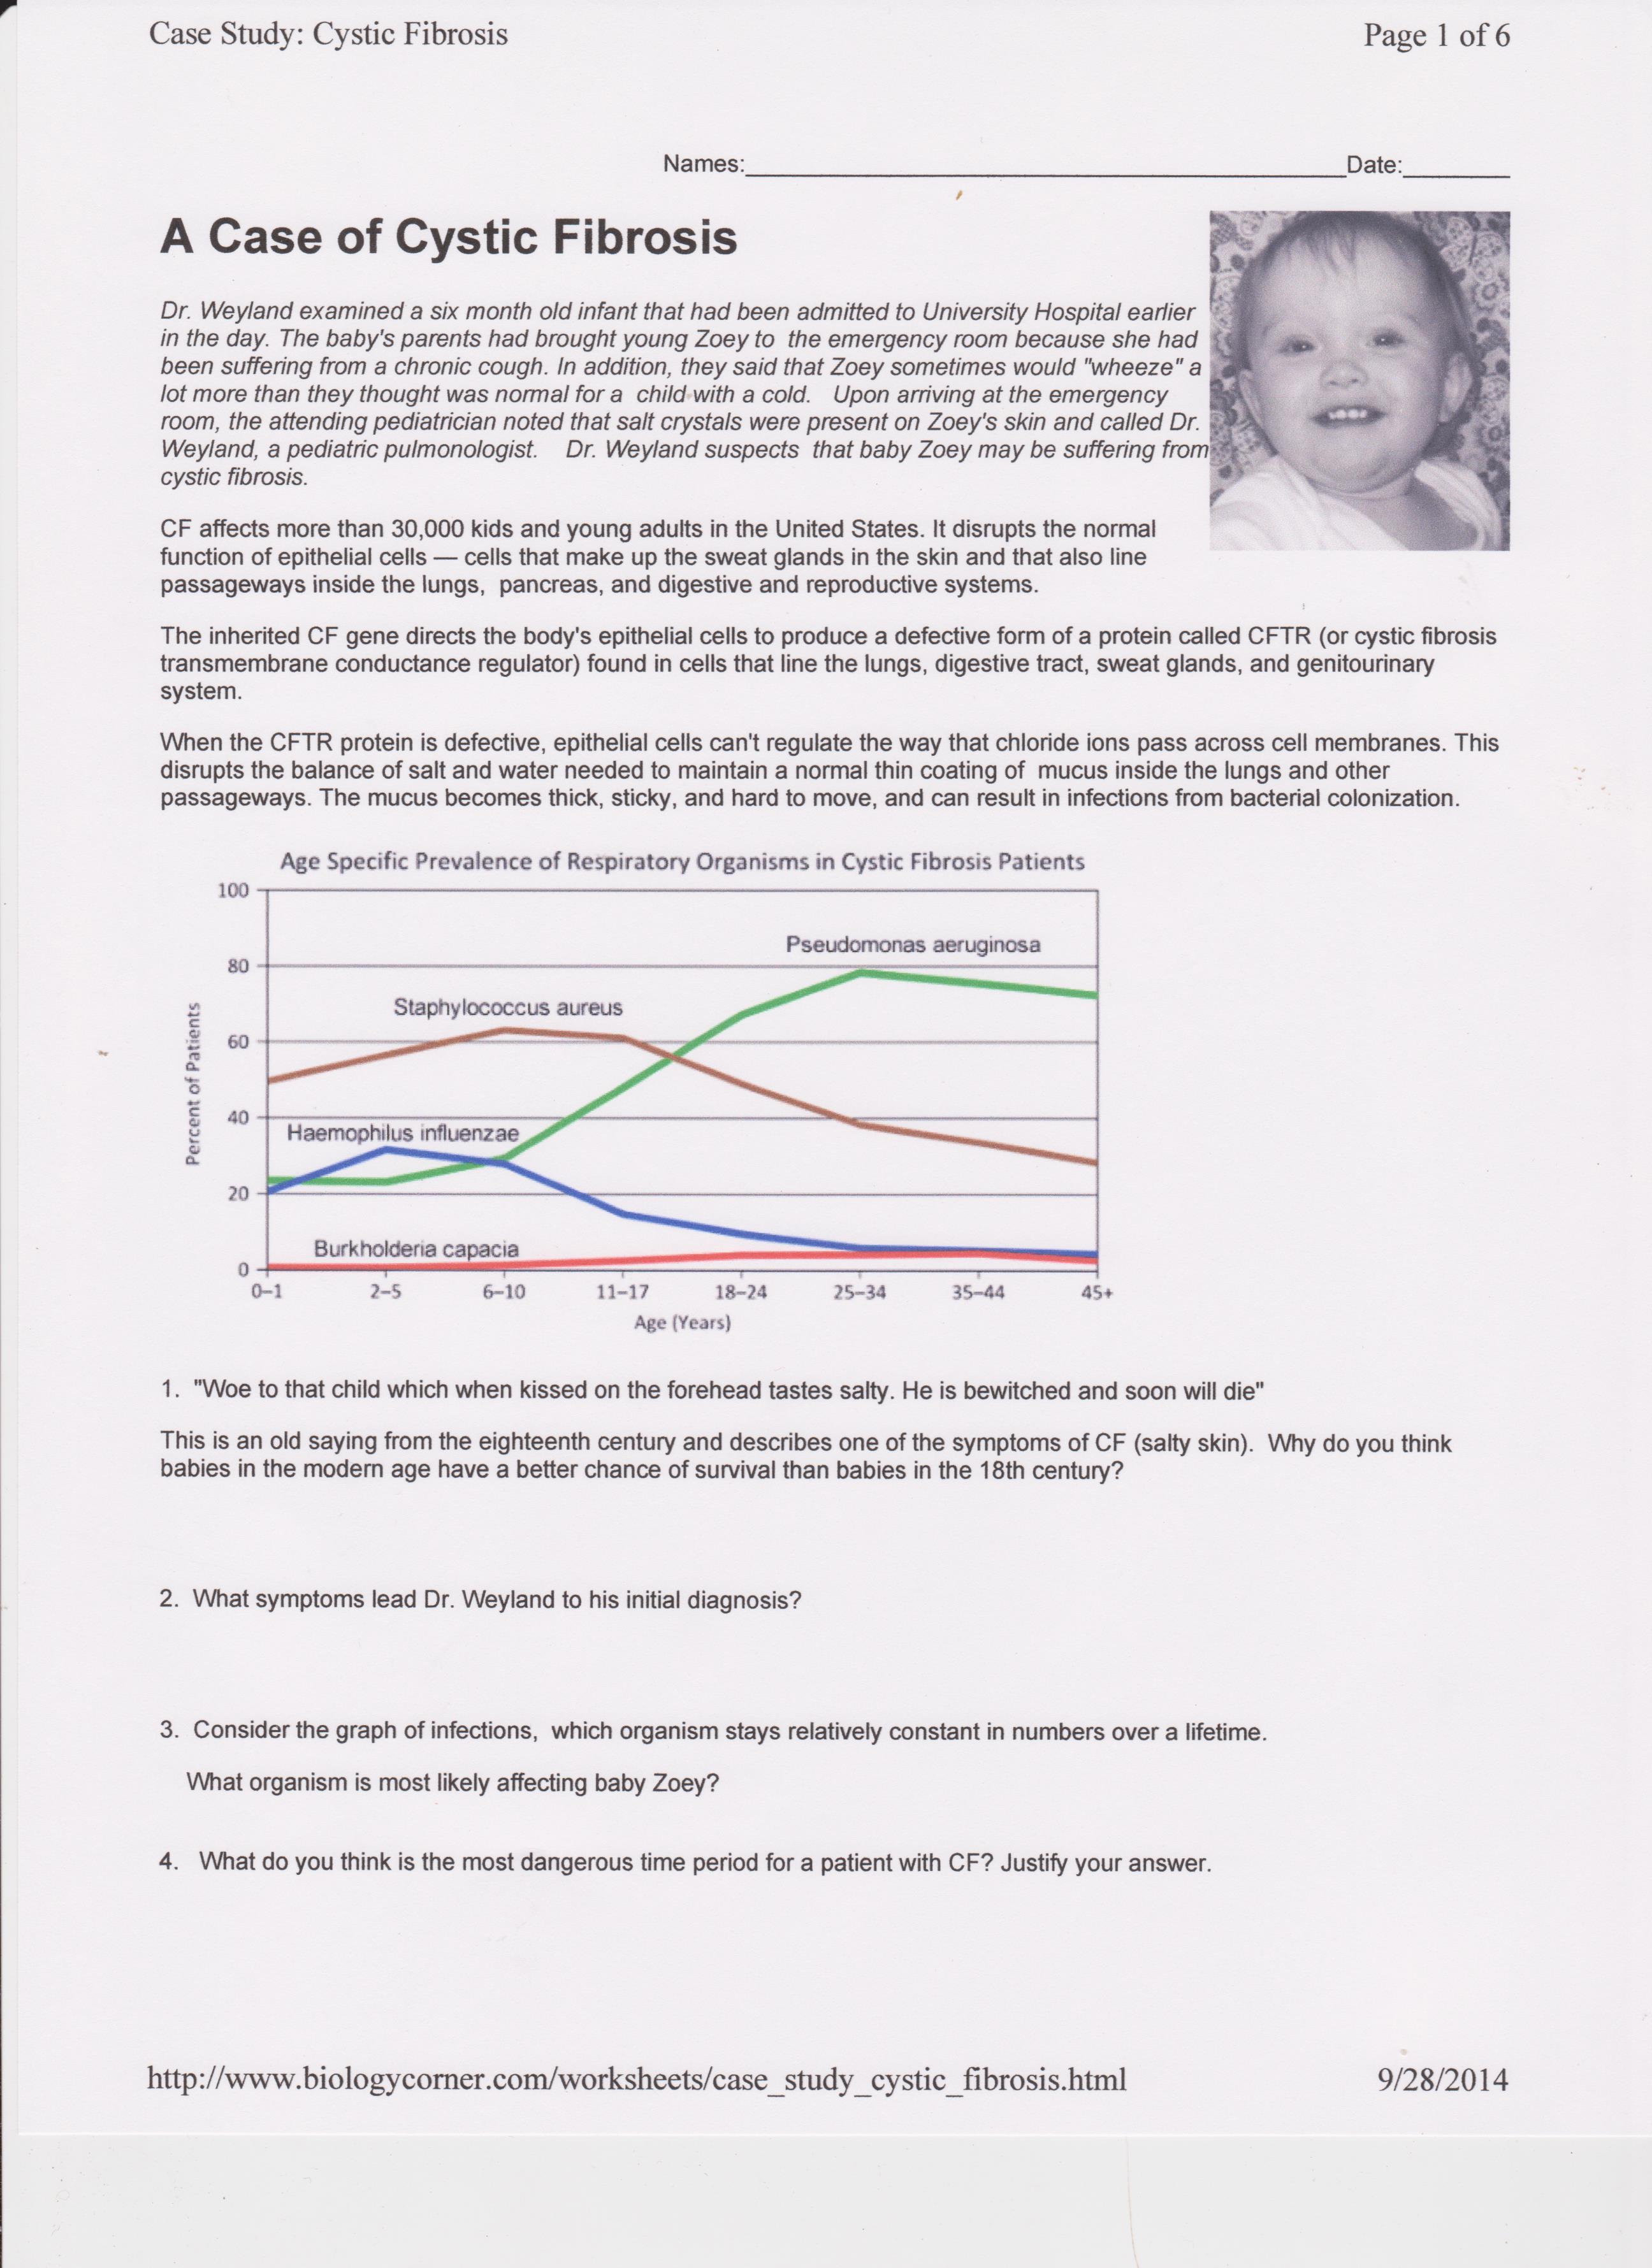 case study answers